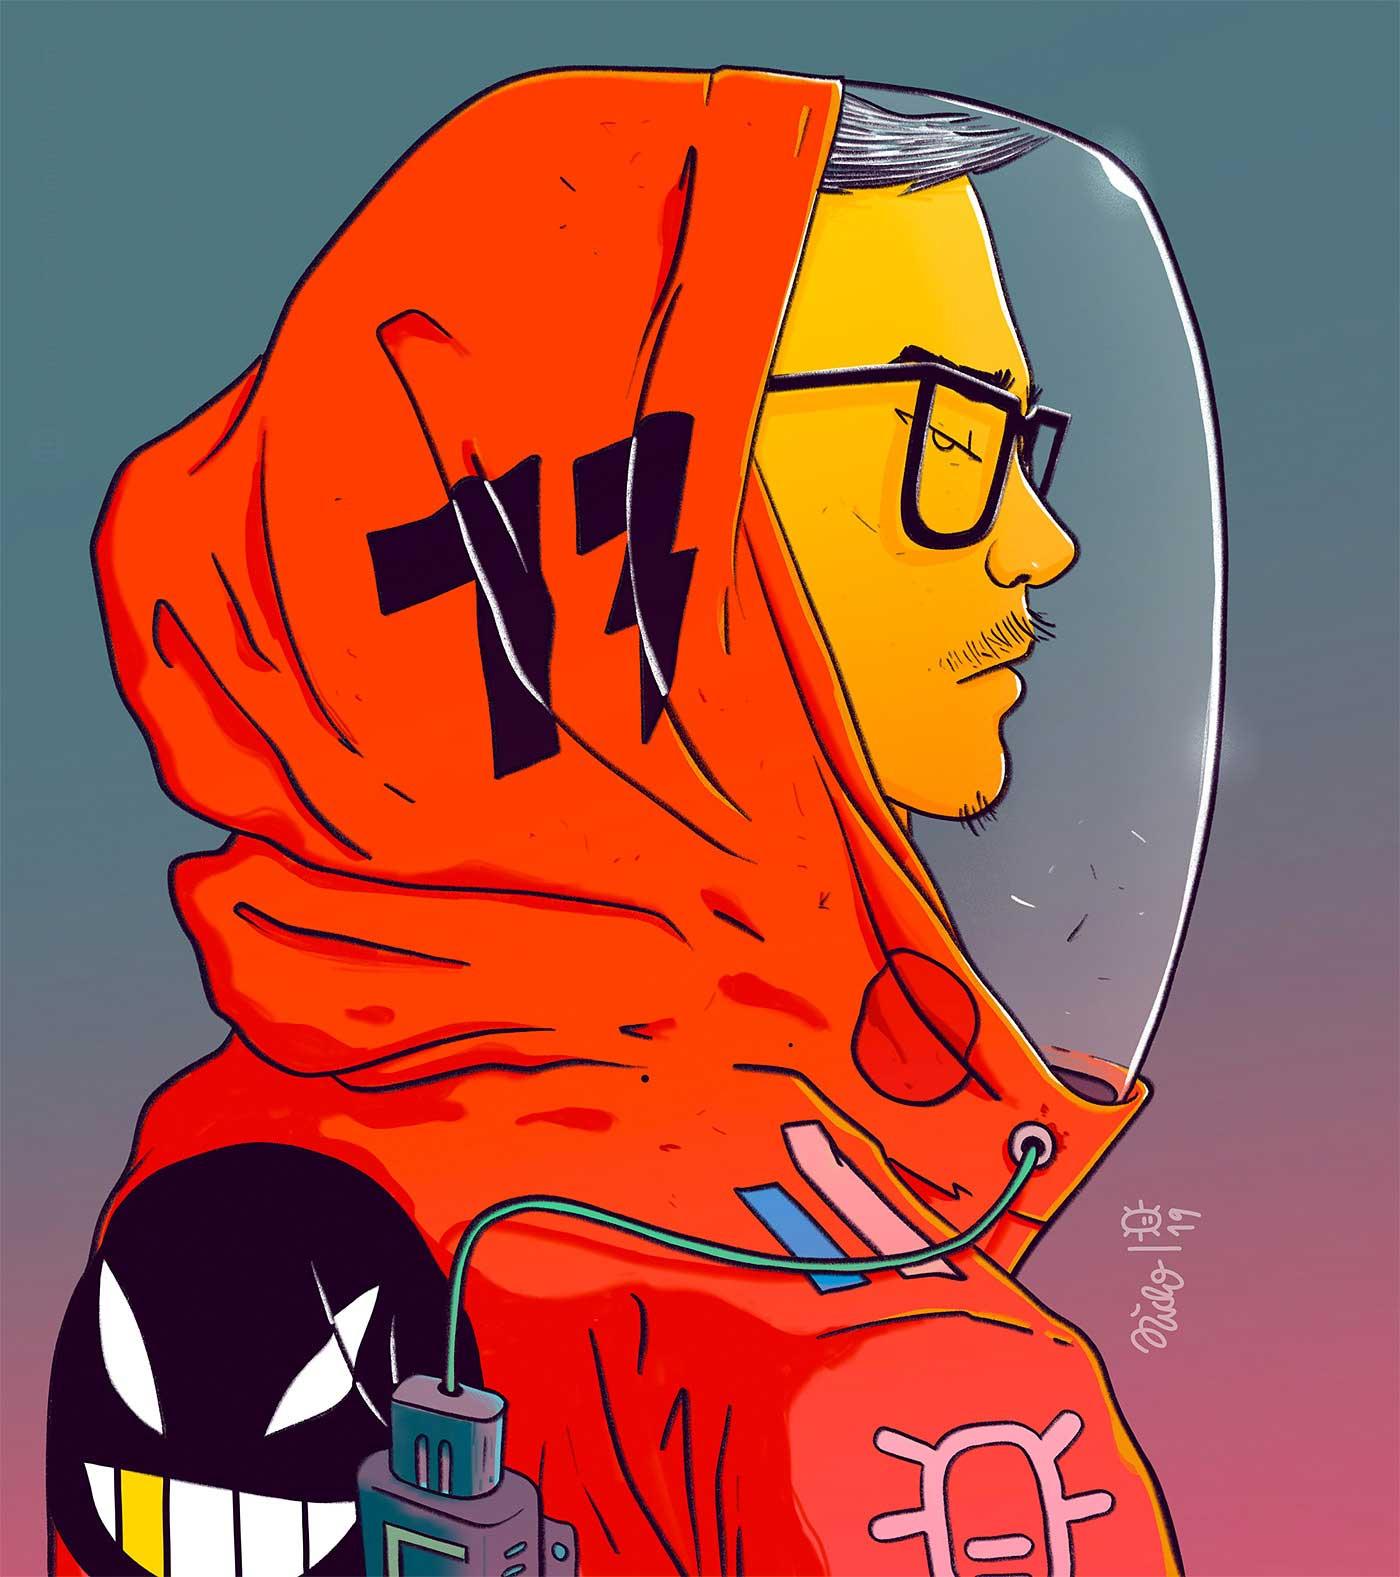 Illustration: Gabriel Suchowolski Gabriel-Suchowolski-illustration_04